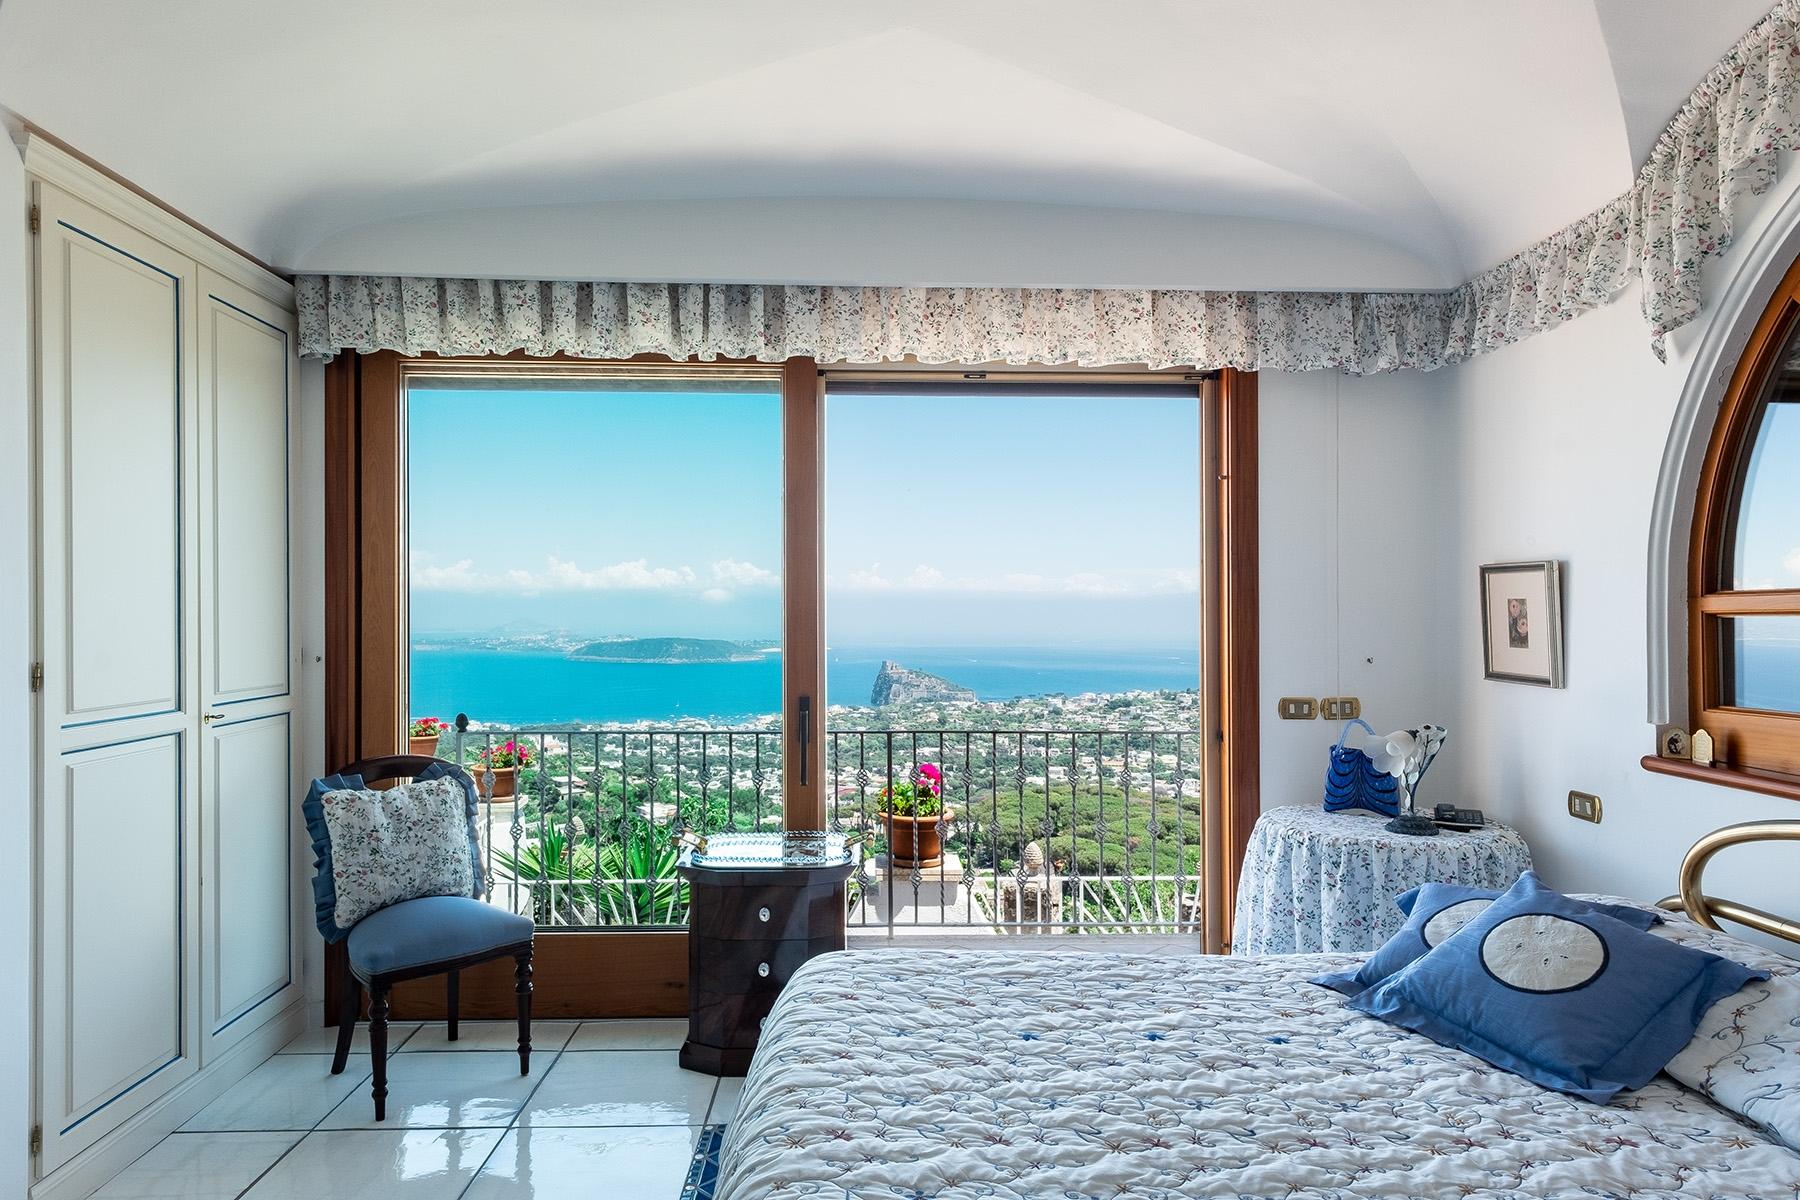 Villa in Vendita a Ischia: 5 locali, 138 mq - Foto 18